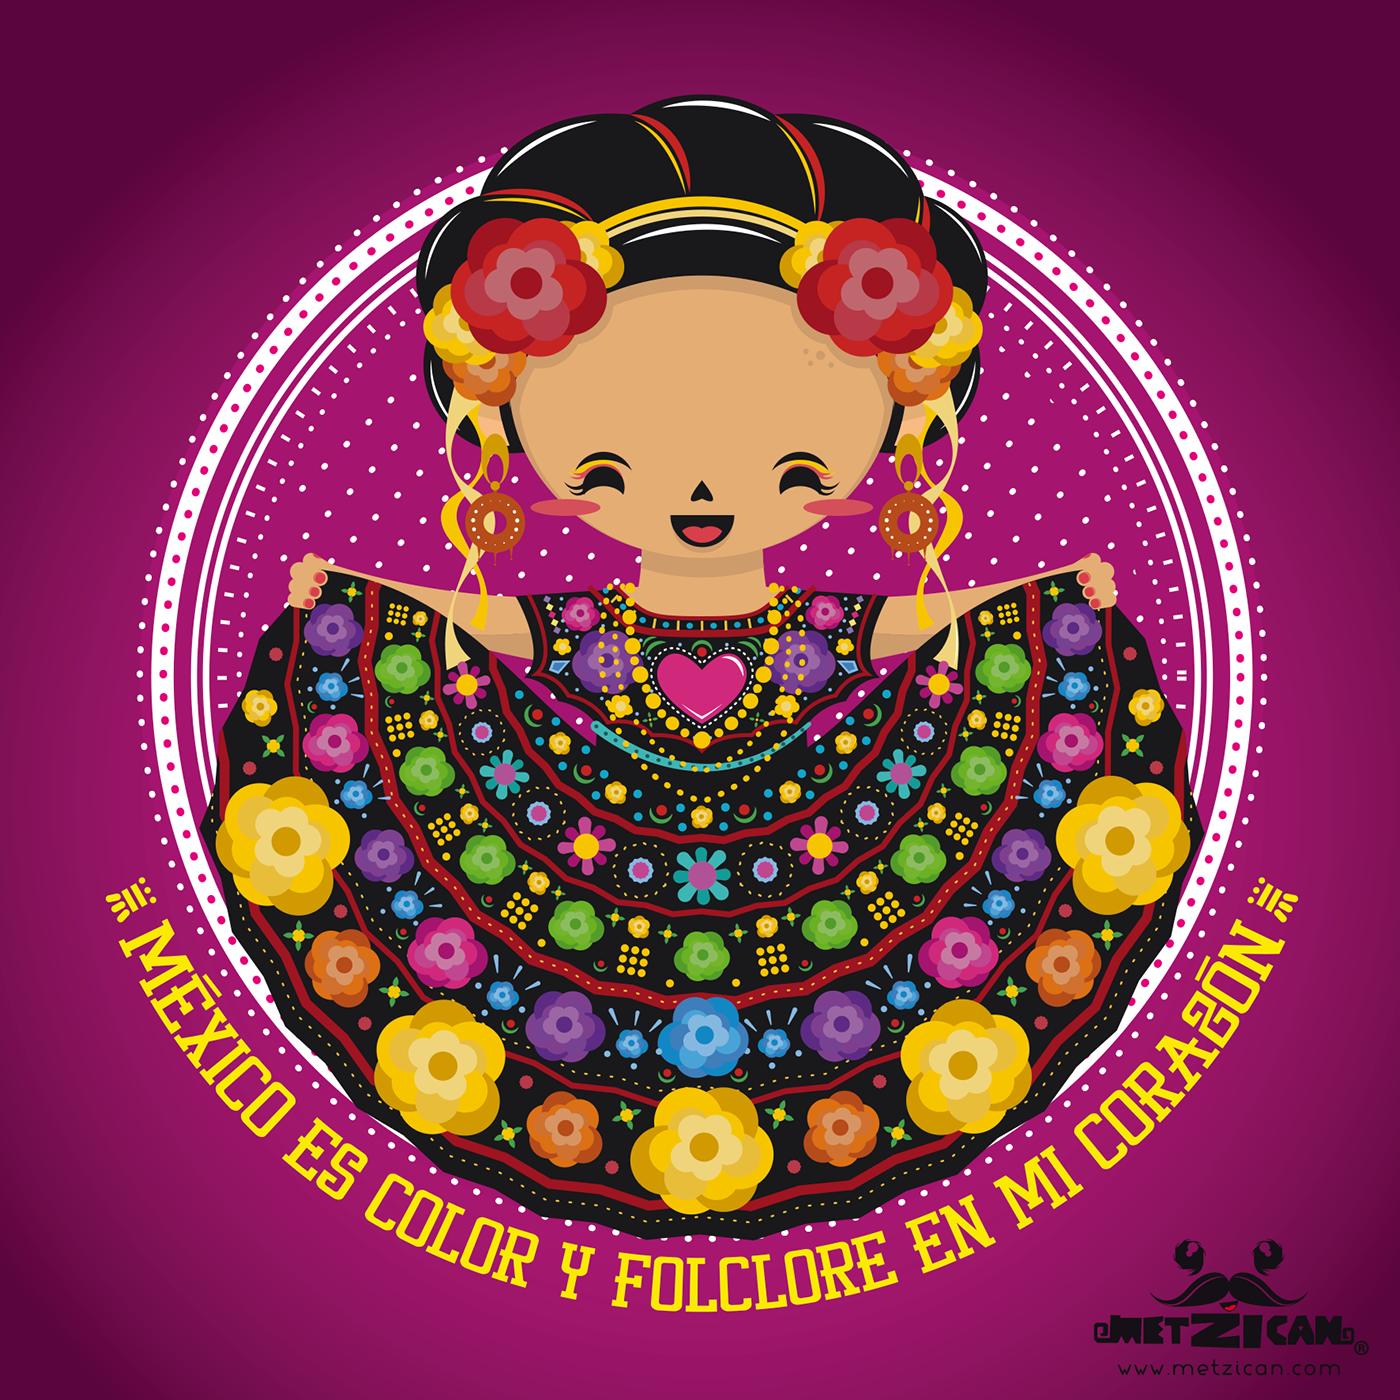 folclore mexicano on behance heart vector art free download heart vector art free